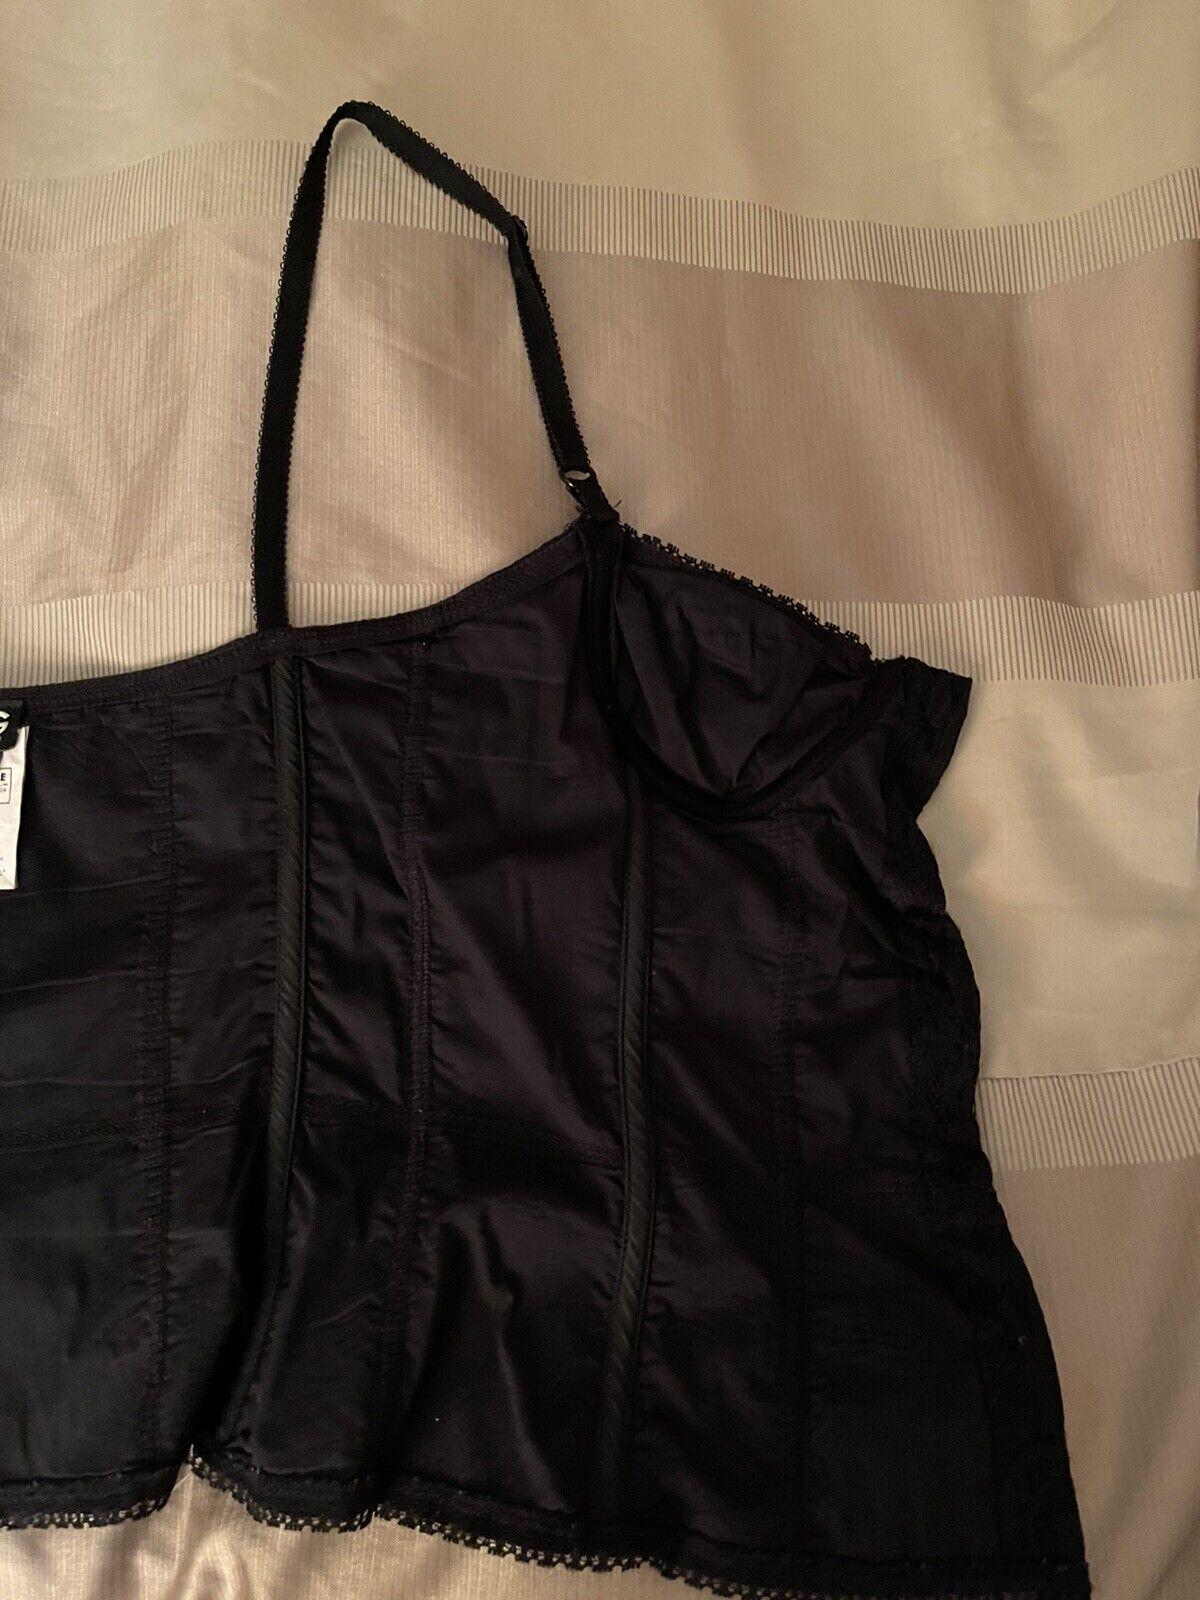 Dolce& Gabbana Black Lace Corset Top Size 26/40 - image 9